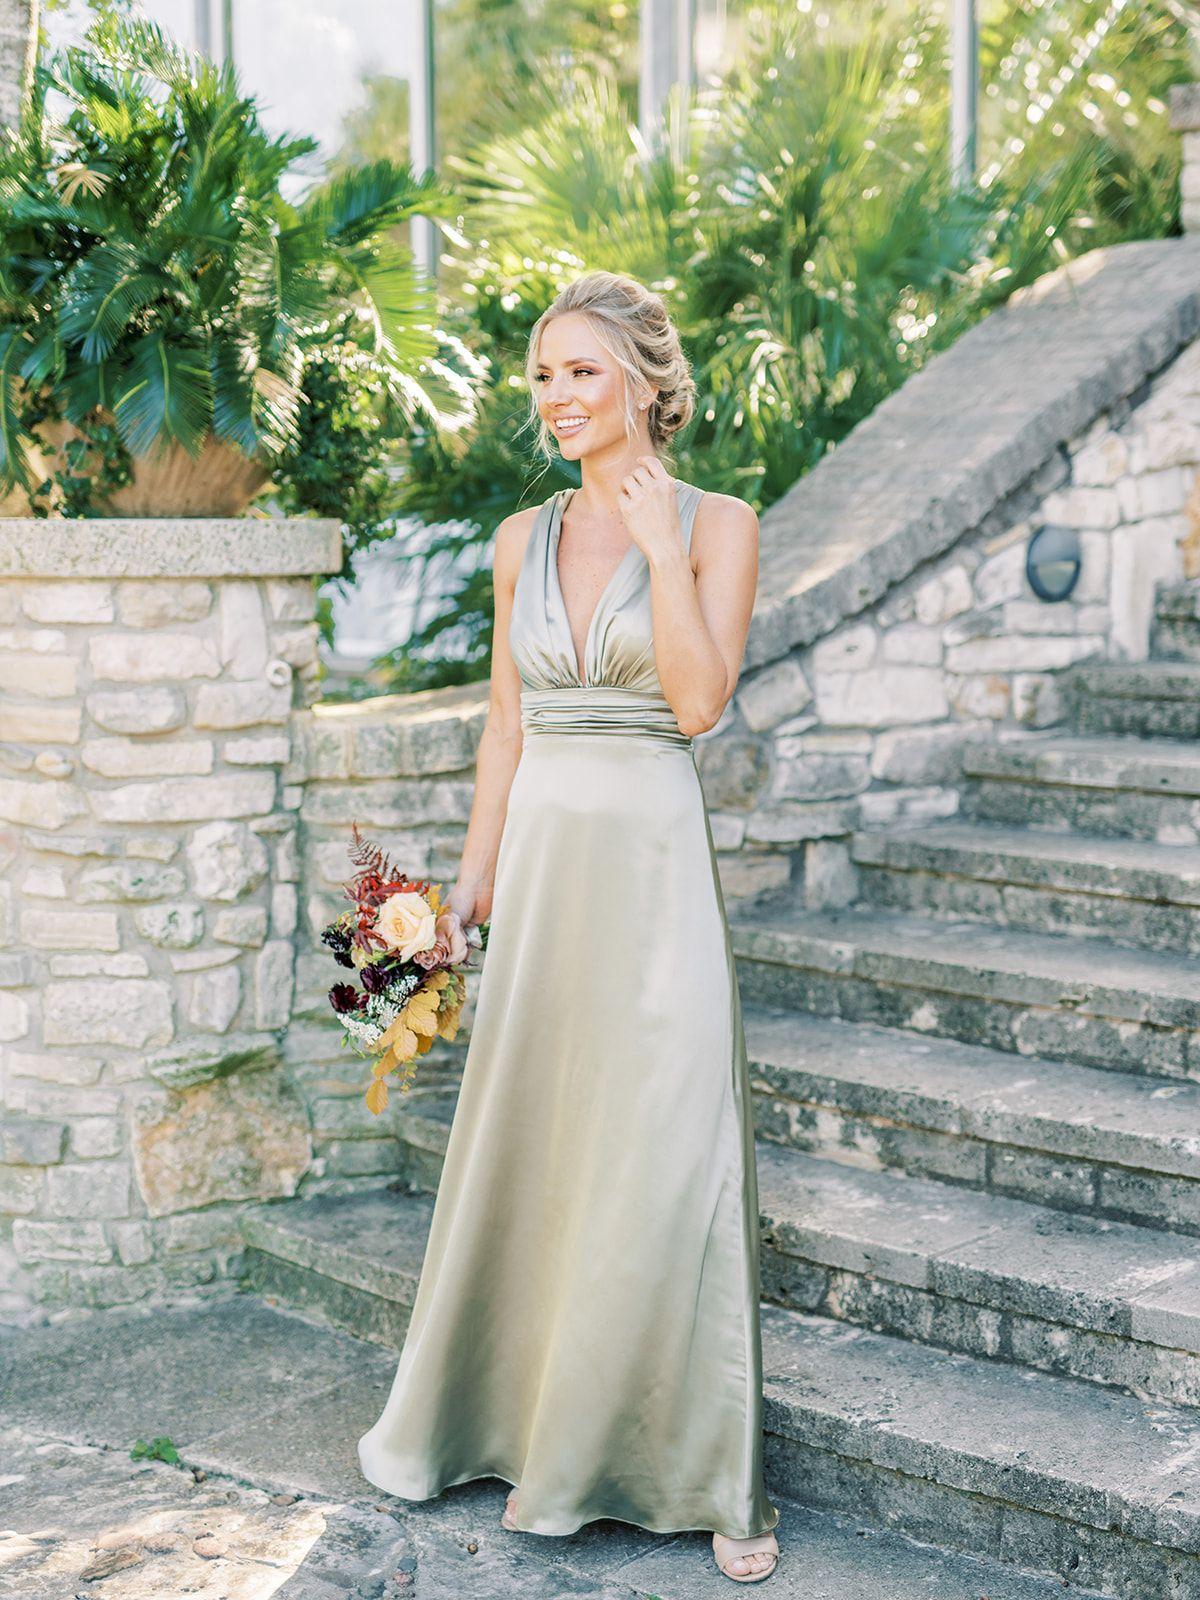 Dylan Satin Dress In 2021 Sage Bridesmaid Dresses Mint Bridesmaid Dresses Satin Bridesmaid Dresses [ 1600 x 1200 Pixel ]